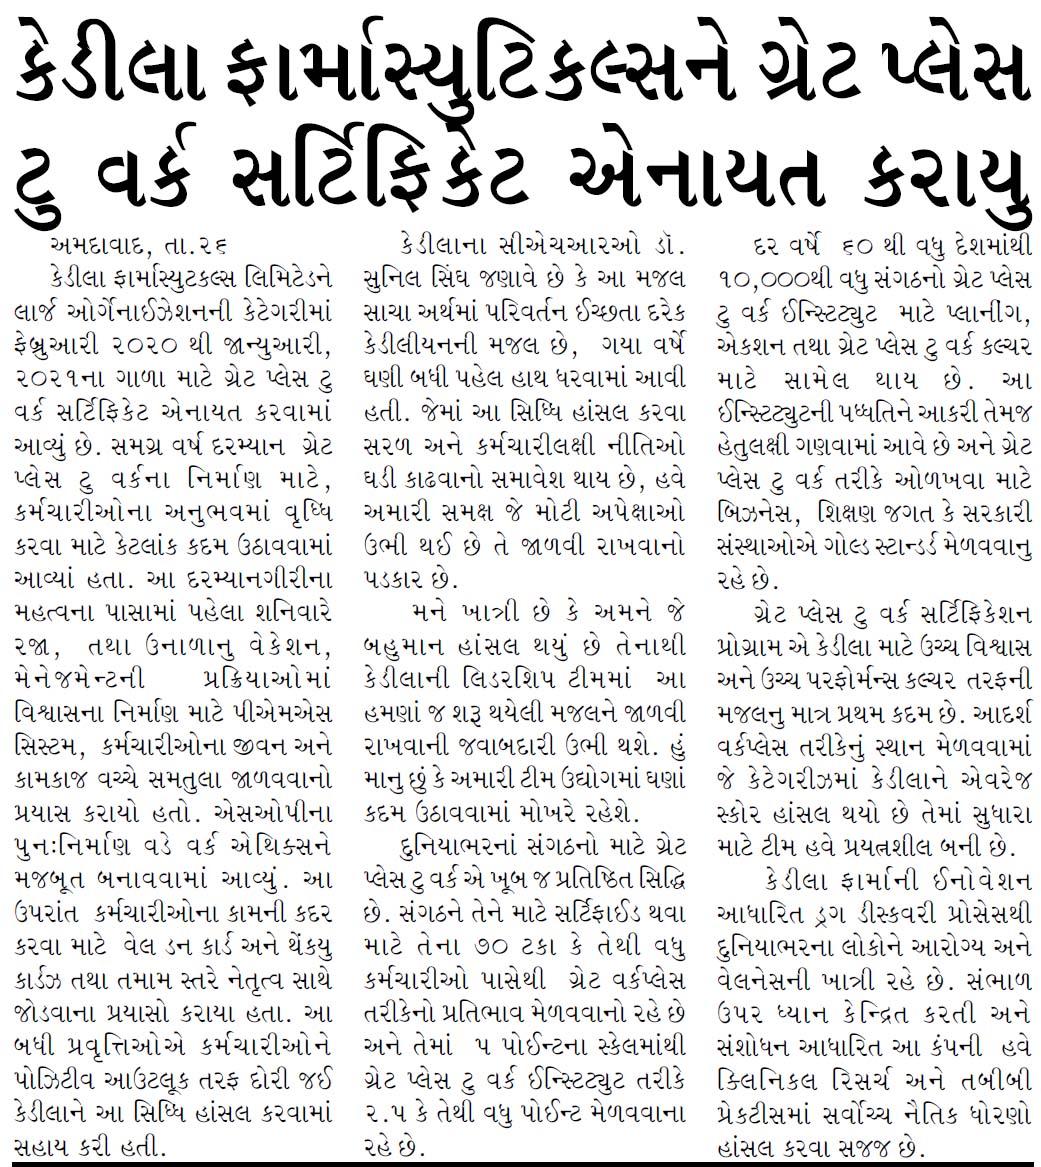 News Line Sidha Samachar Coverage